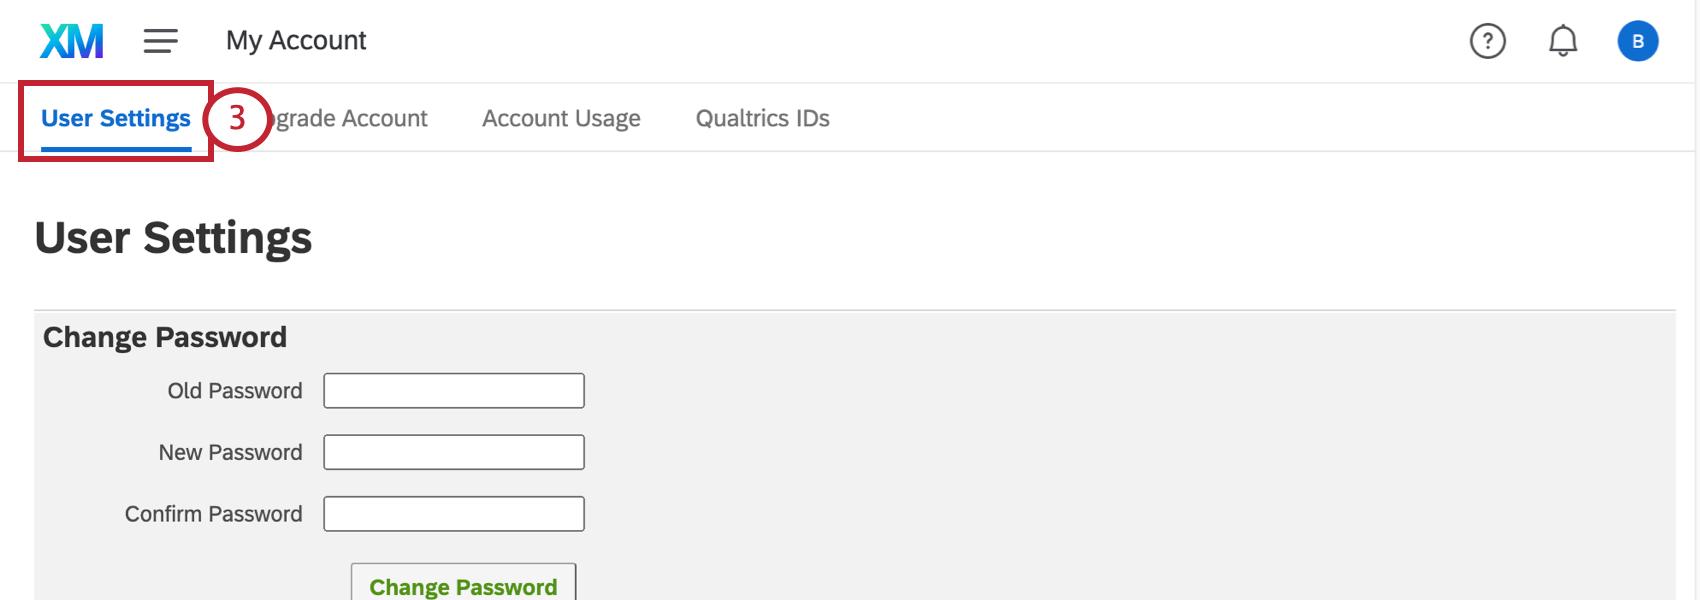 User Settings tab